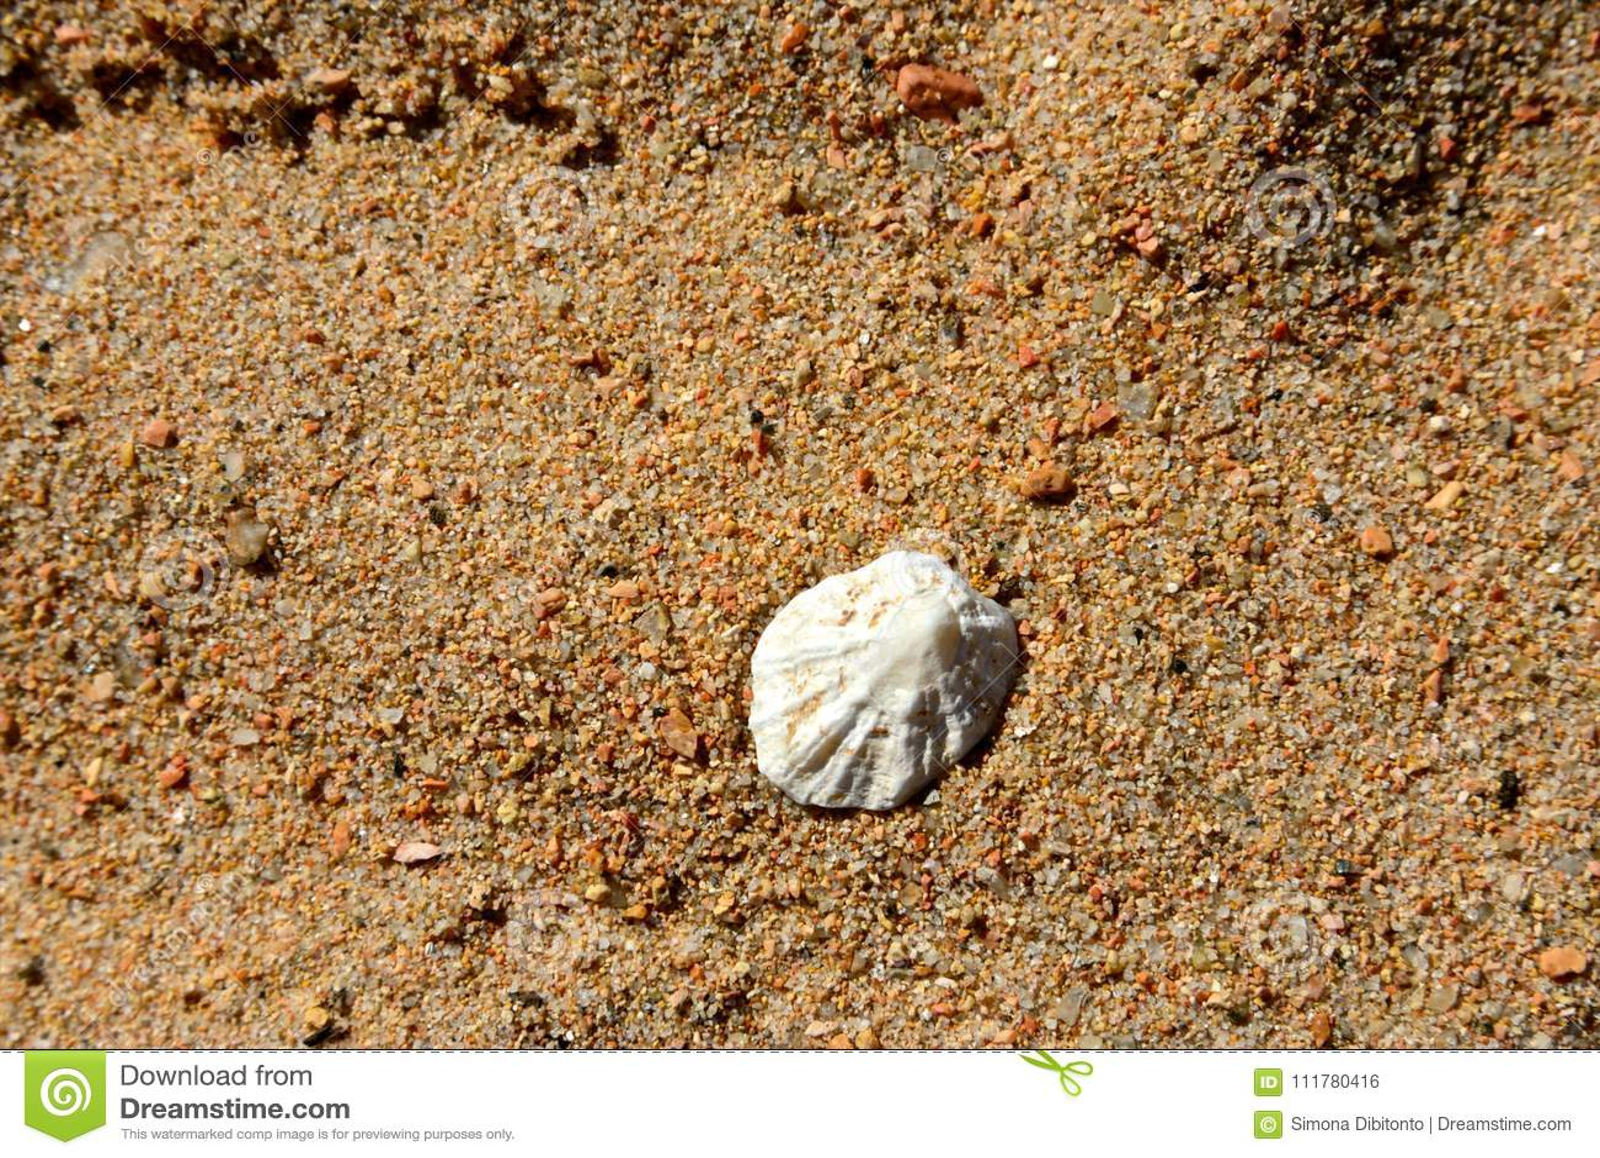 Closeup of one white shell